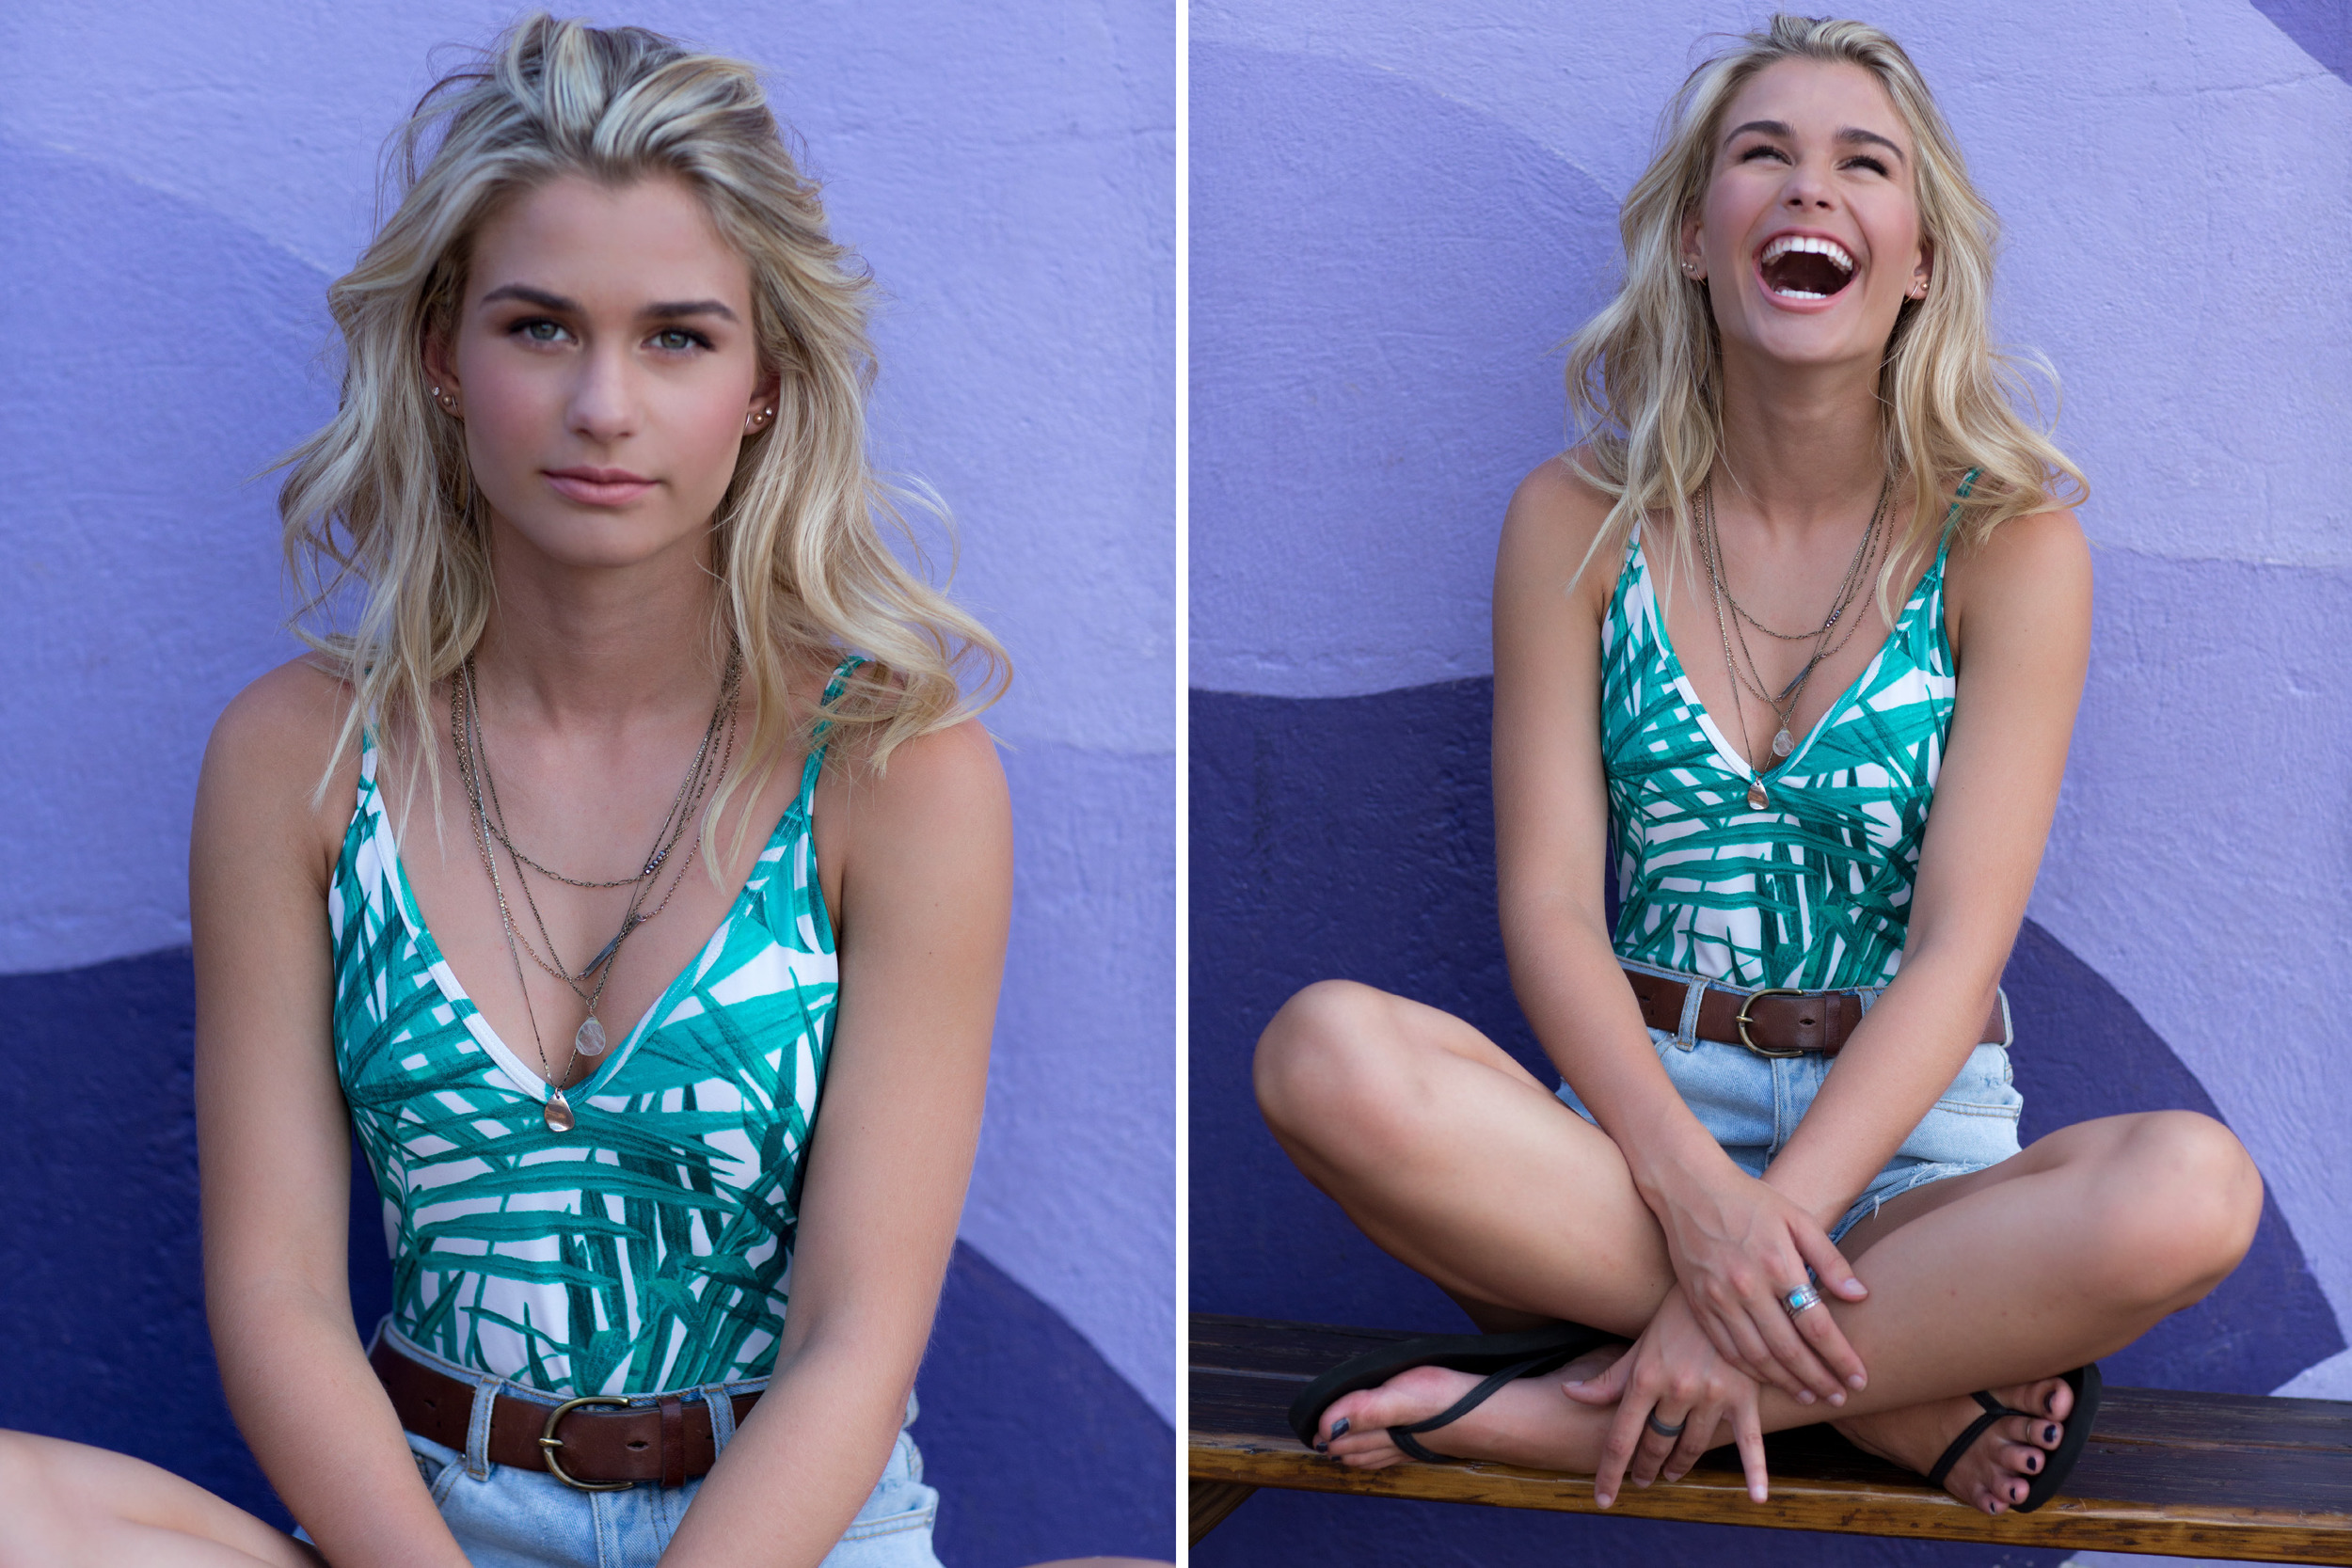 purple-wall-blonde-cross-legged.jpg